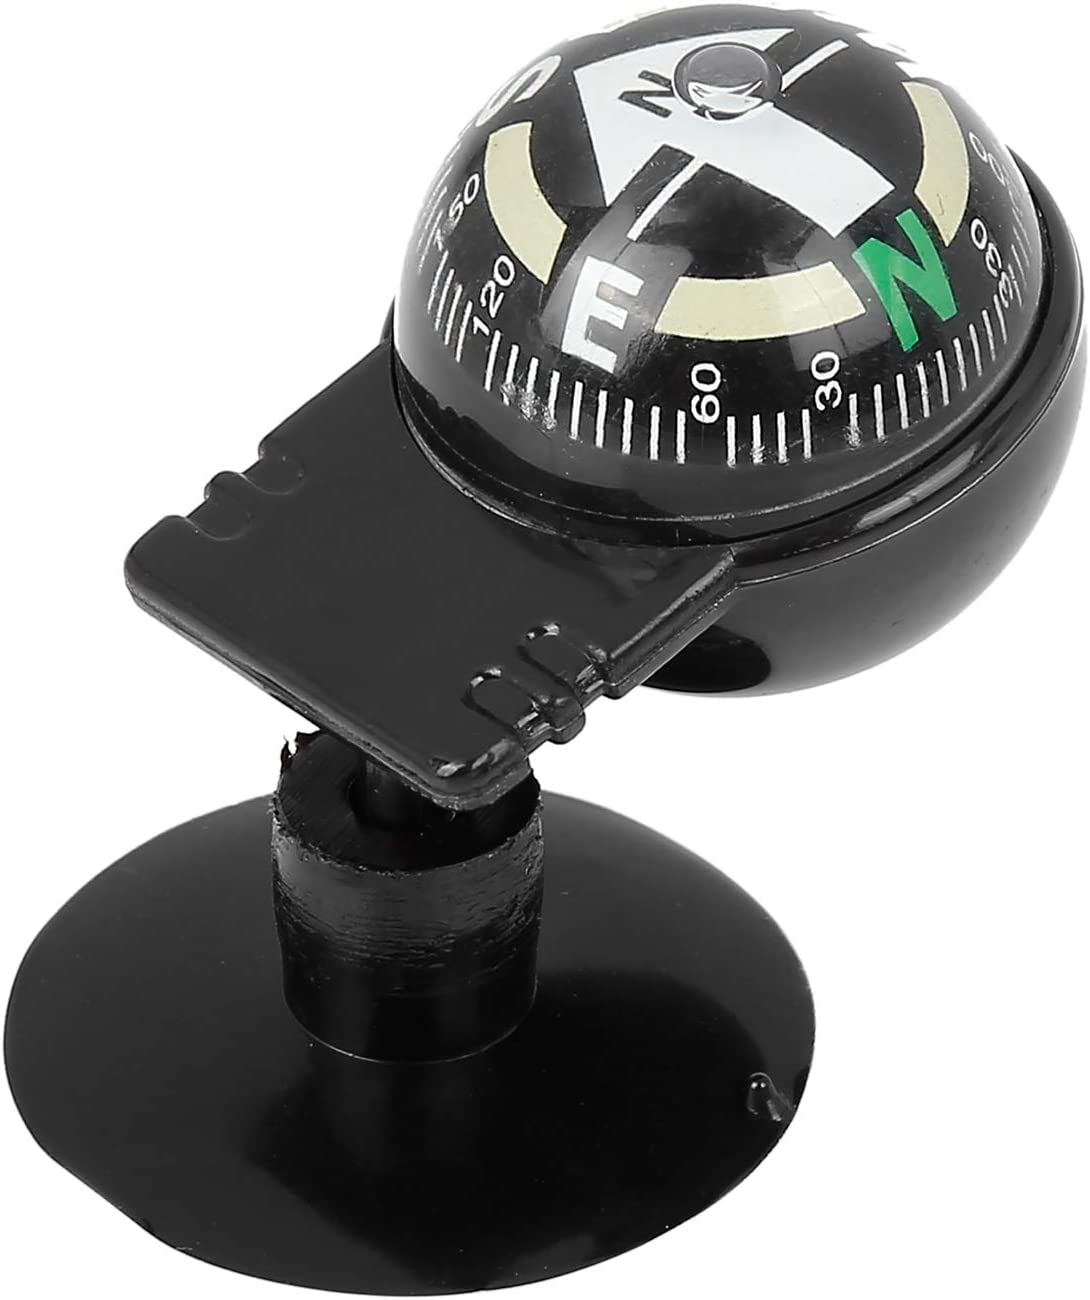 X AUTOHAUX 2pcs Car Compass Ball Sucker Dashboard Mount Navigation Black